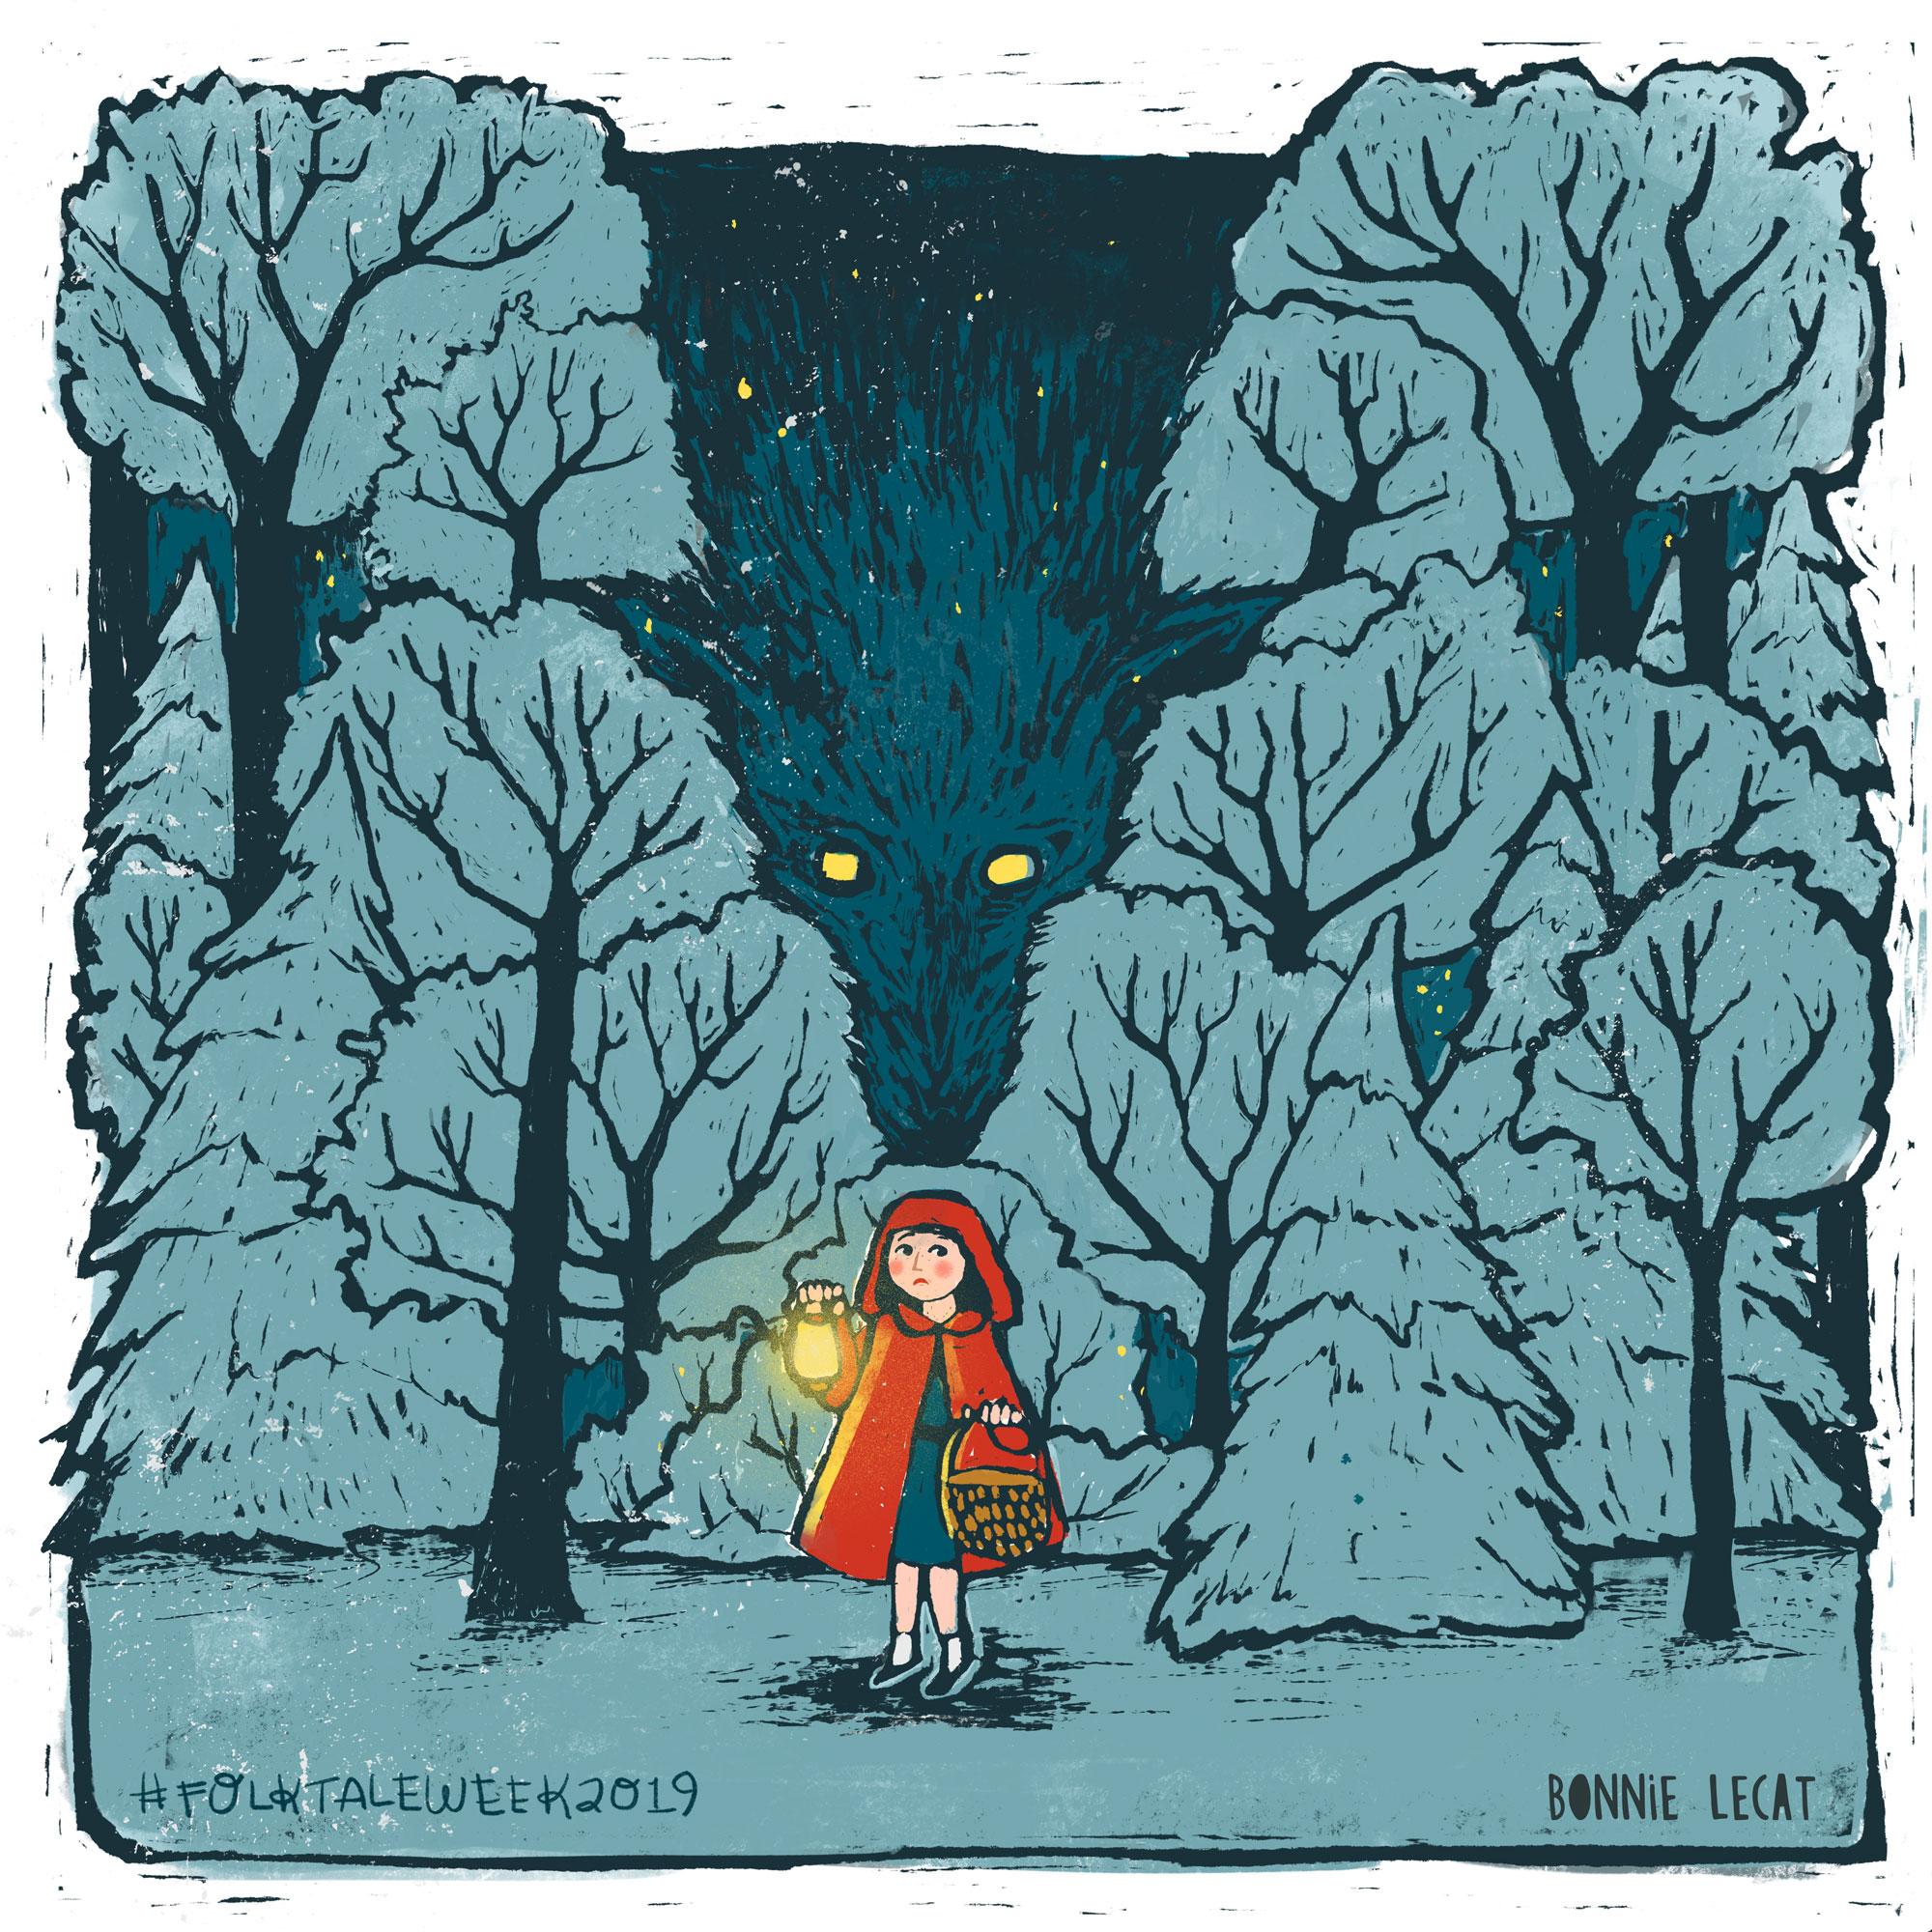 Little Red Riding Children's Book Illustration by Bonnie Lecat